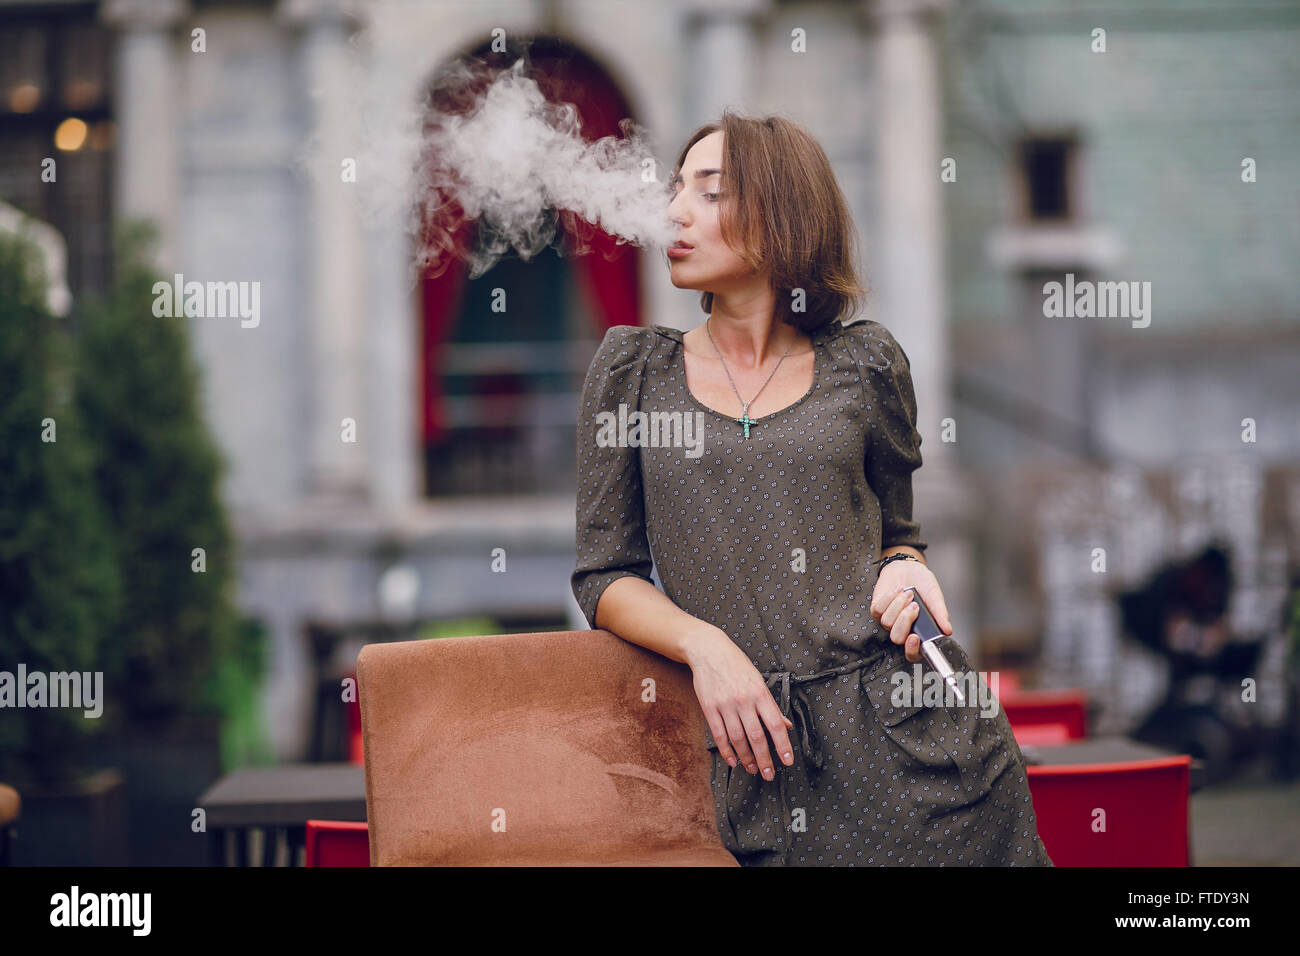 girl with E-cigarette - Stock Image